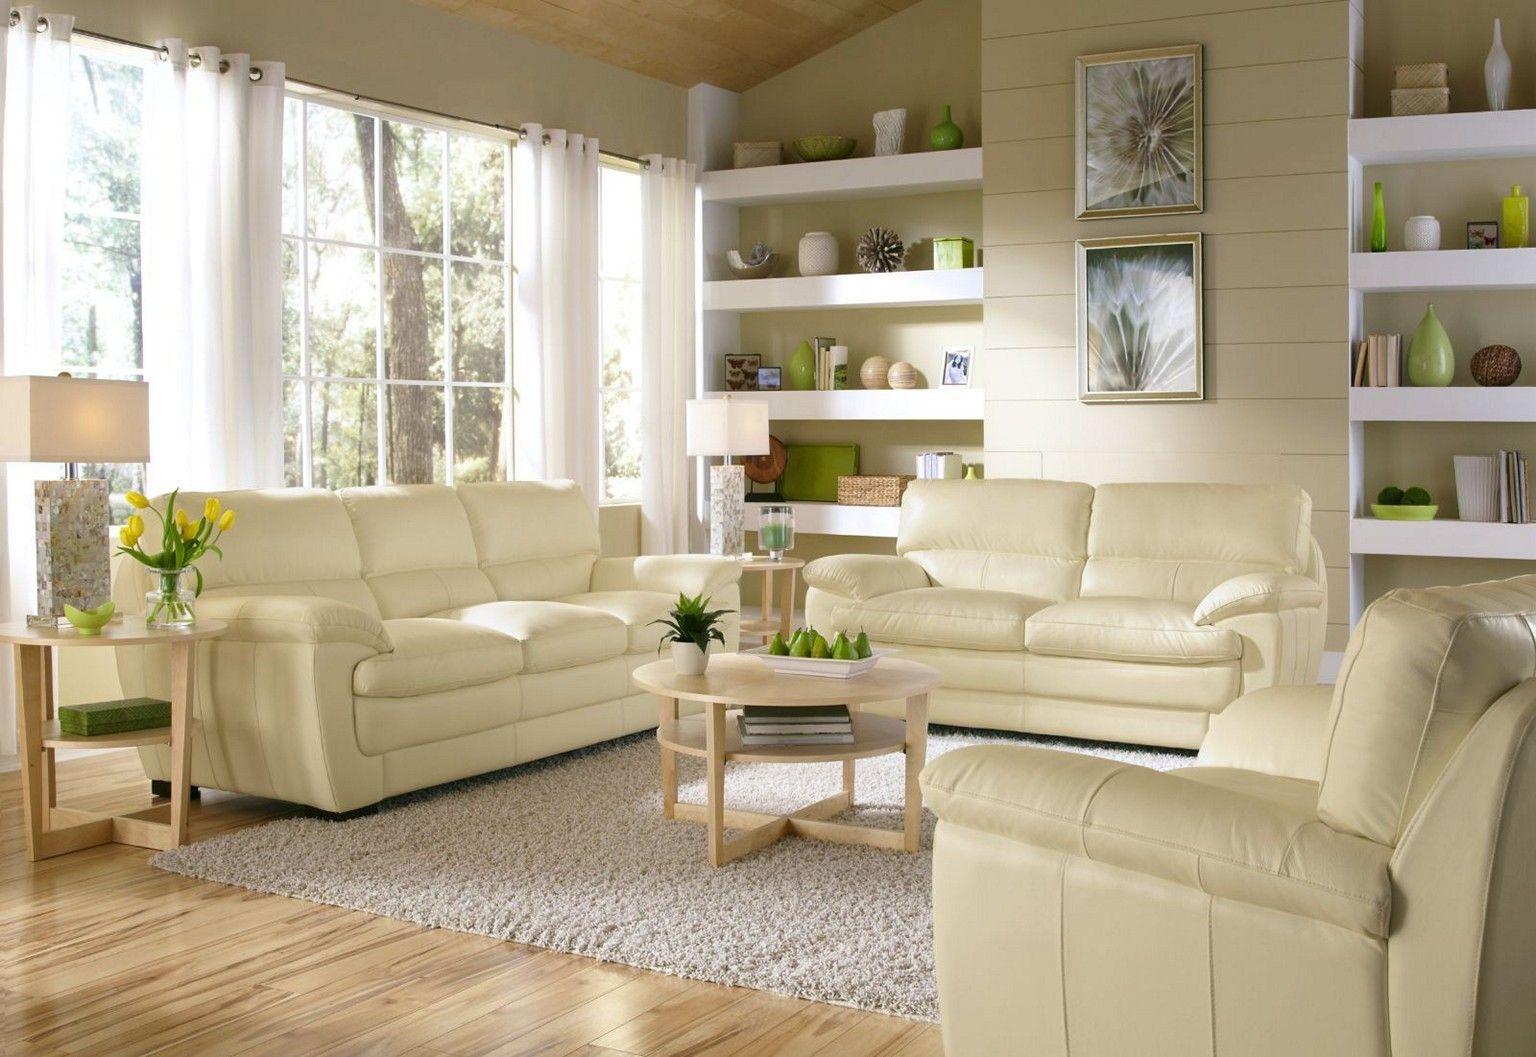 Vig Furniture  Divani Casa Ff135 Modern Black Leather Sectional Awesome Living Room Simple Decorating Ideas Inspiration Design